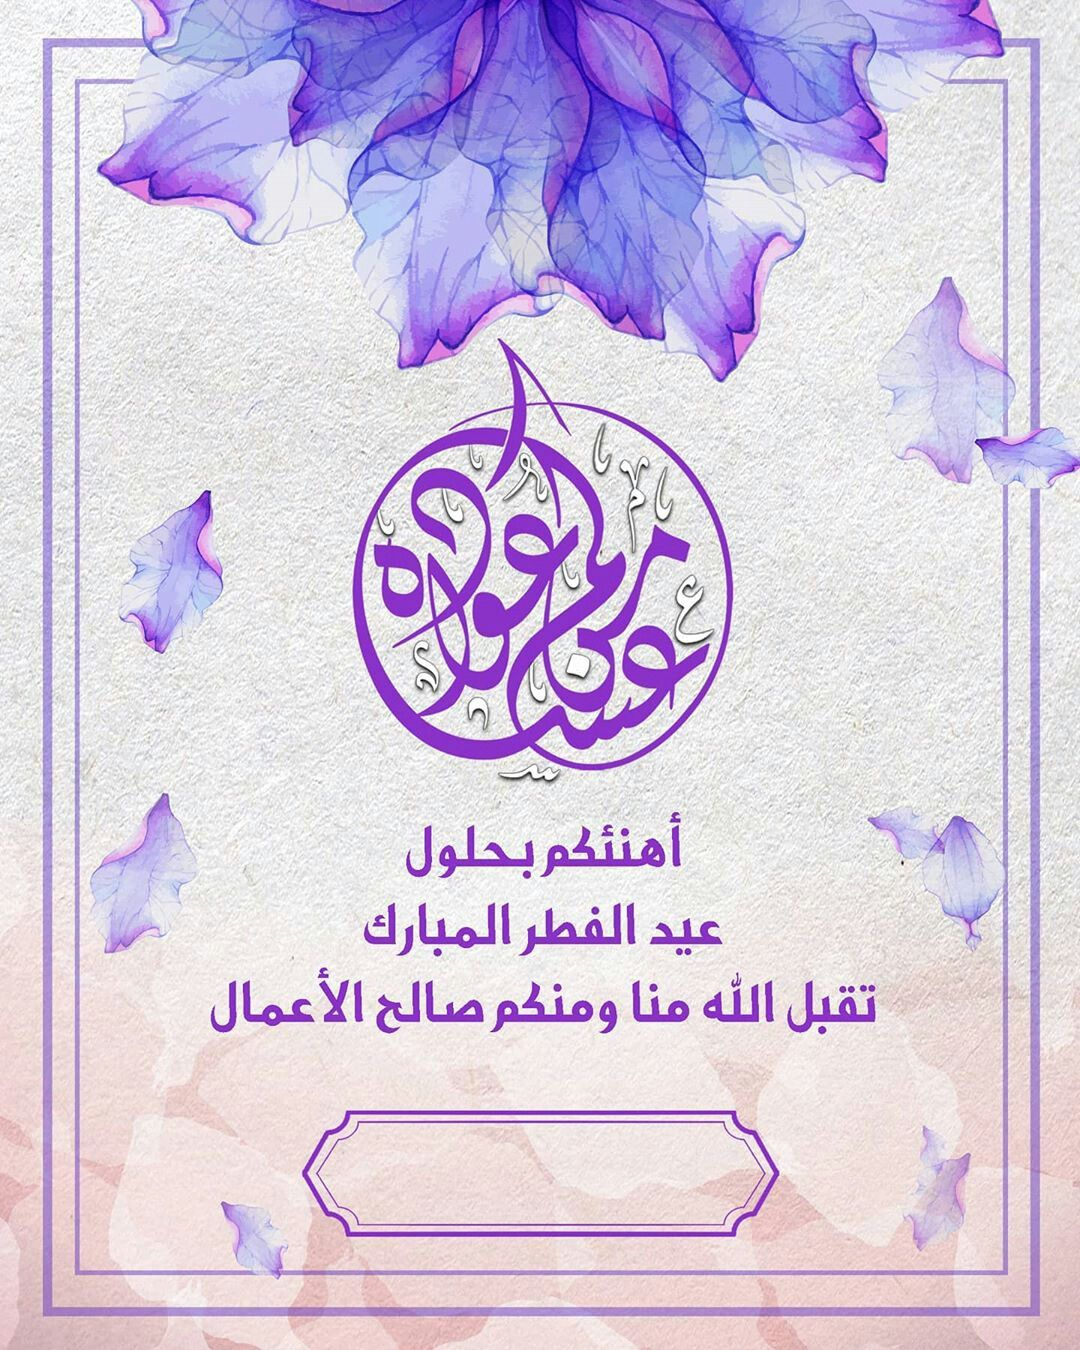 Pin By الصحبة الطيبة On تهنئة عيد الفطر المبارك Islamic Pictures Book Cover Art